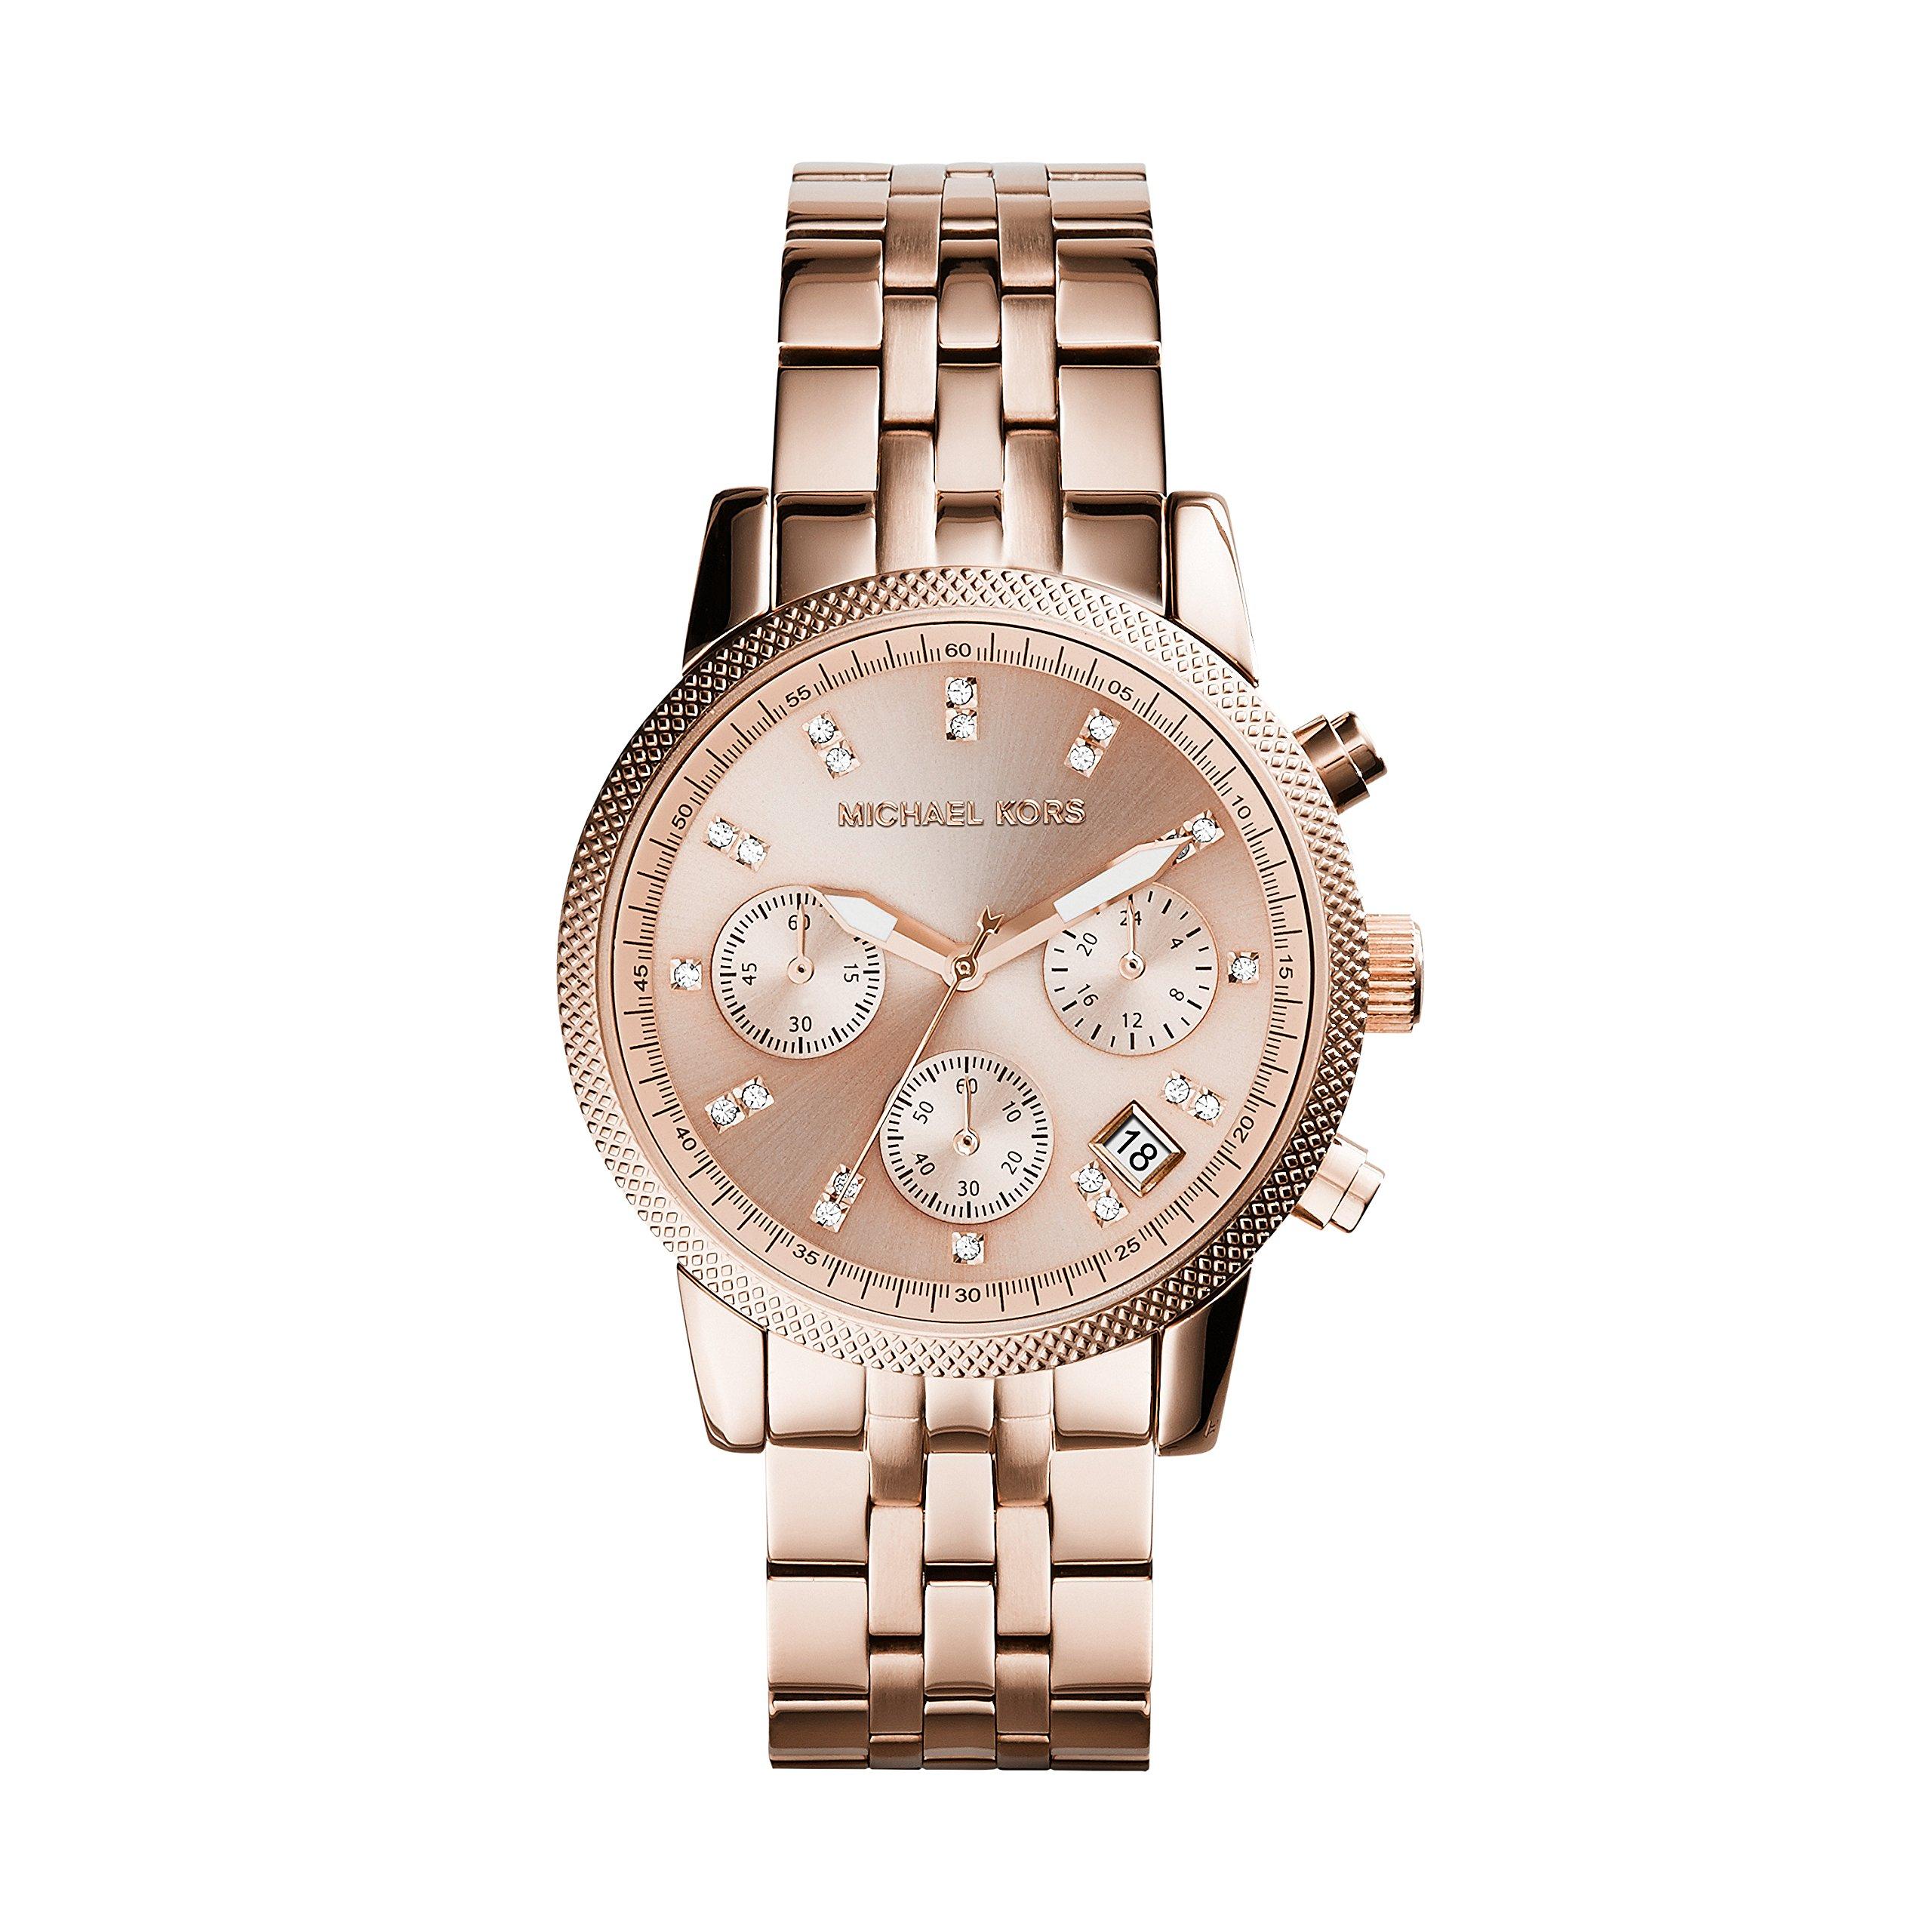 Michael Kors MK6077 Ladies Ritz Rose Gold Plated Chronograph Watch by Michael Kors